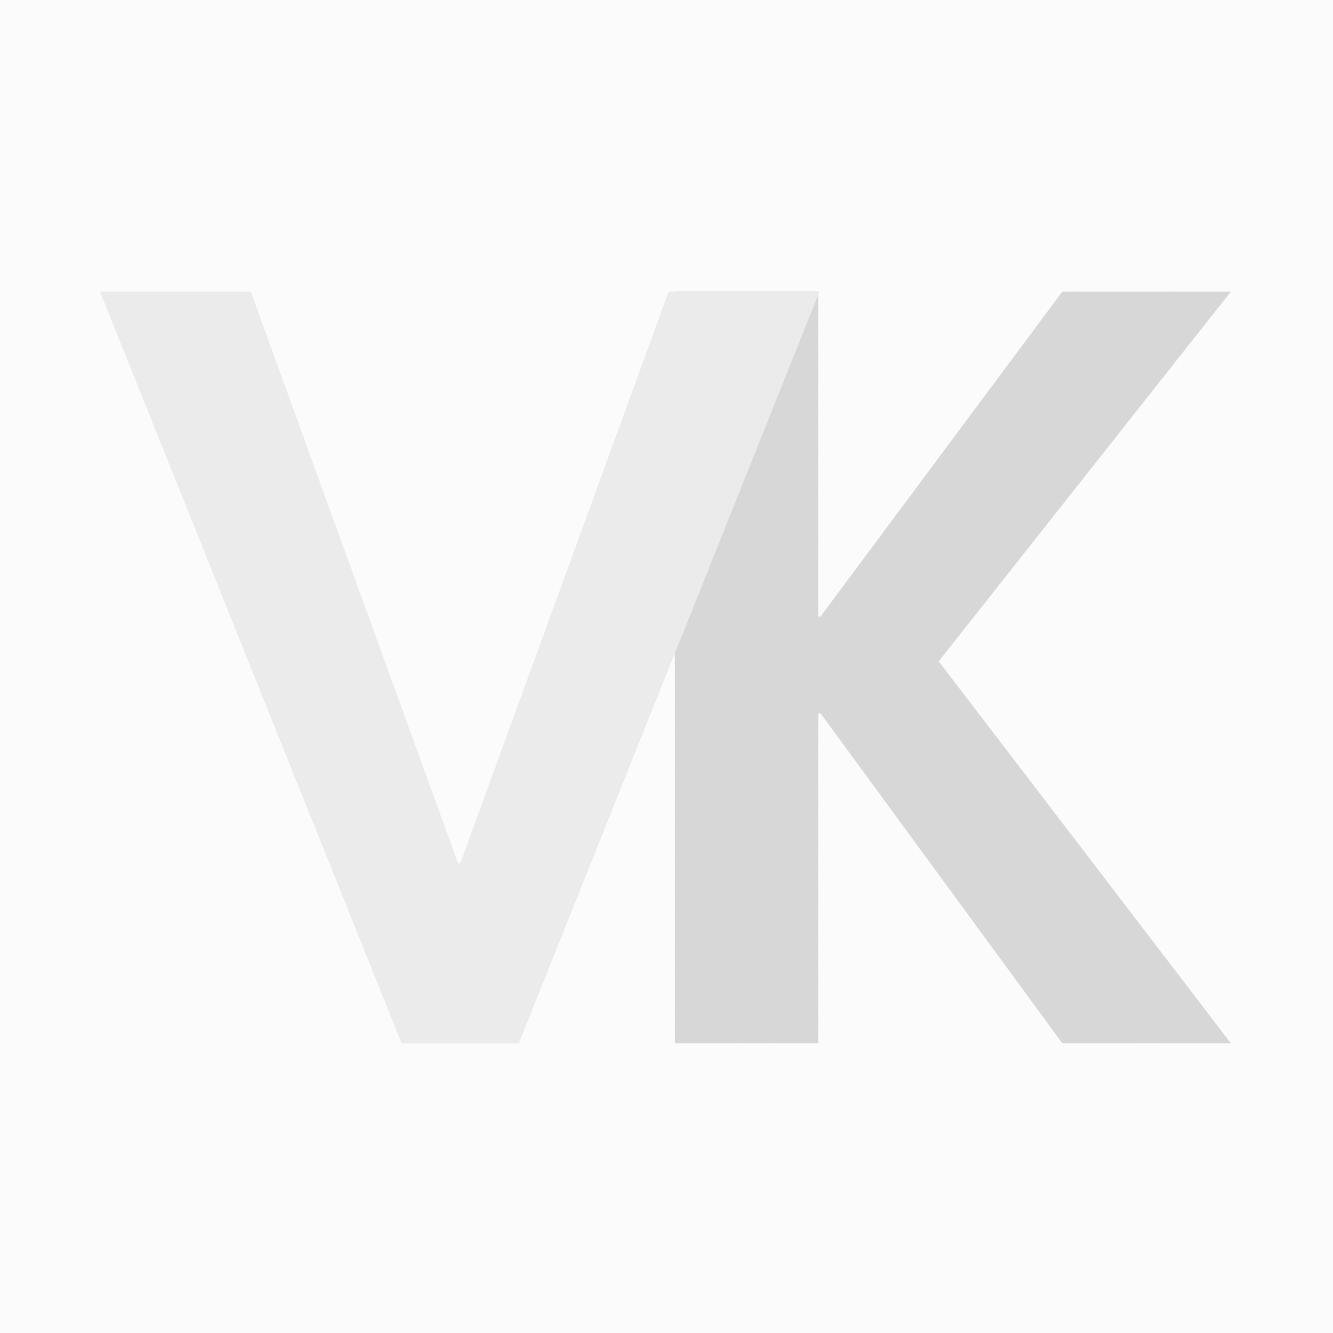 Kyone 800 Slice Kappersschaar 7.0